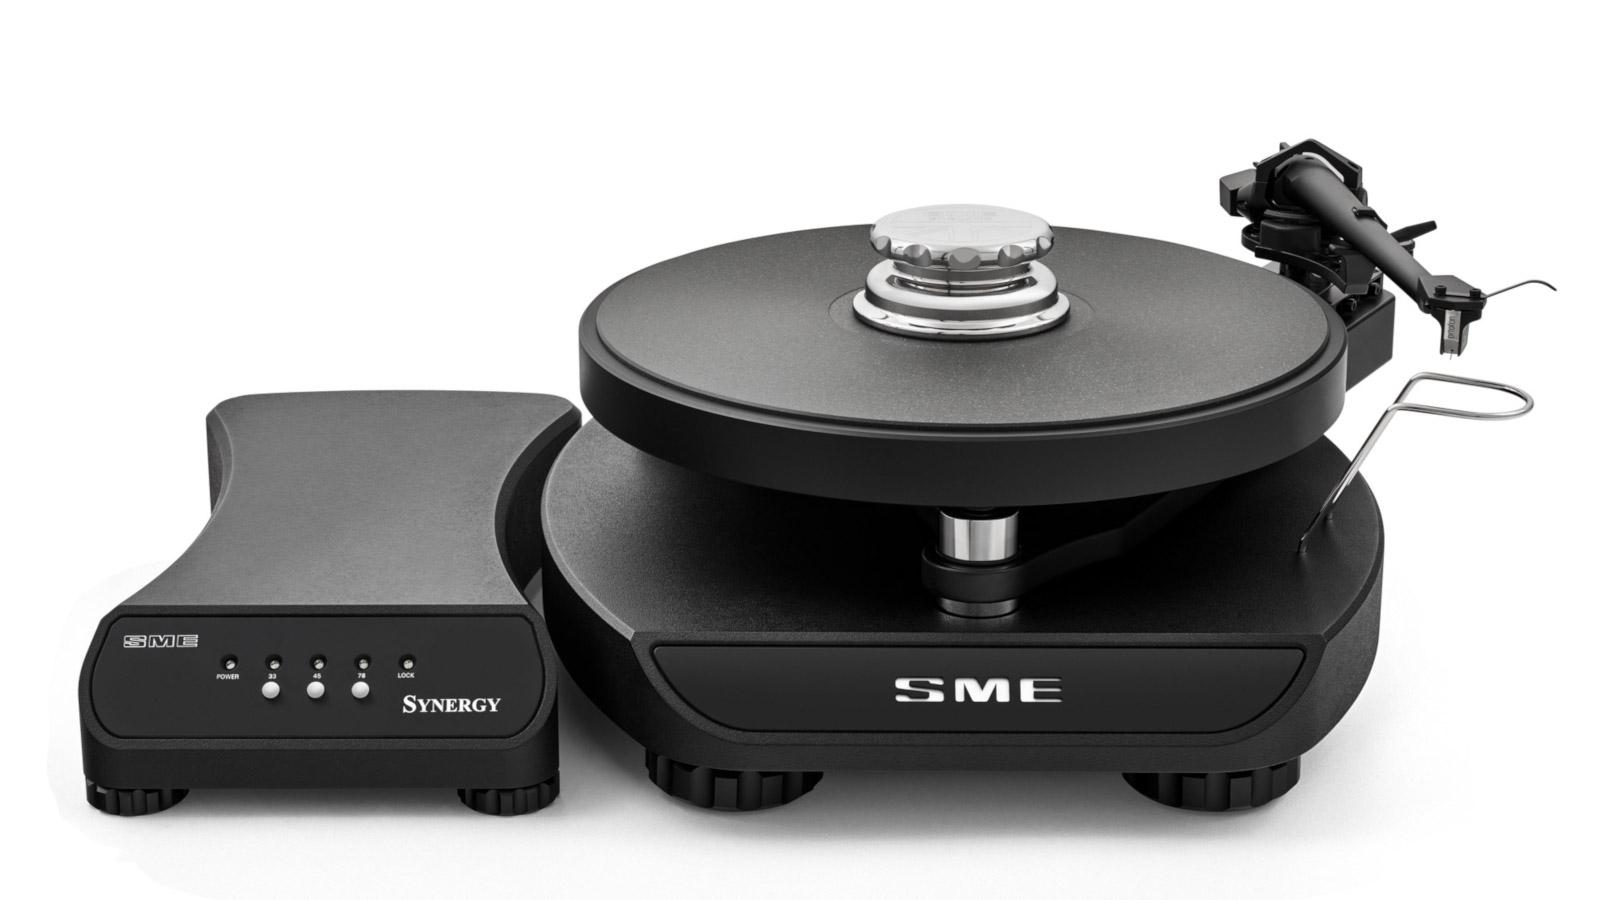 sme-audio-synergy-turntables